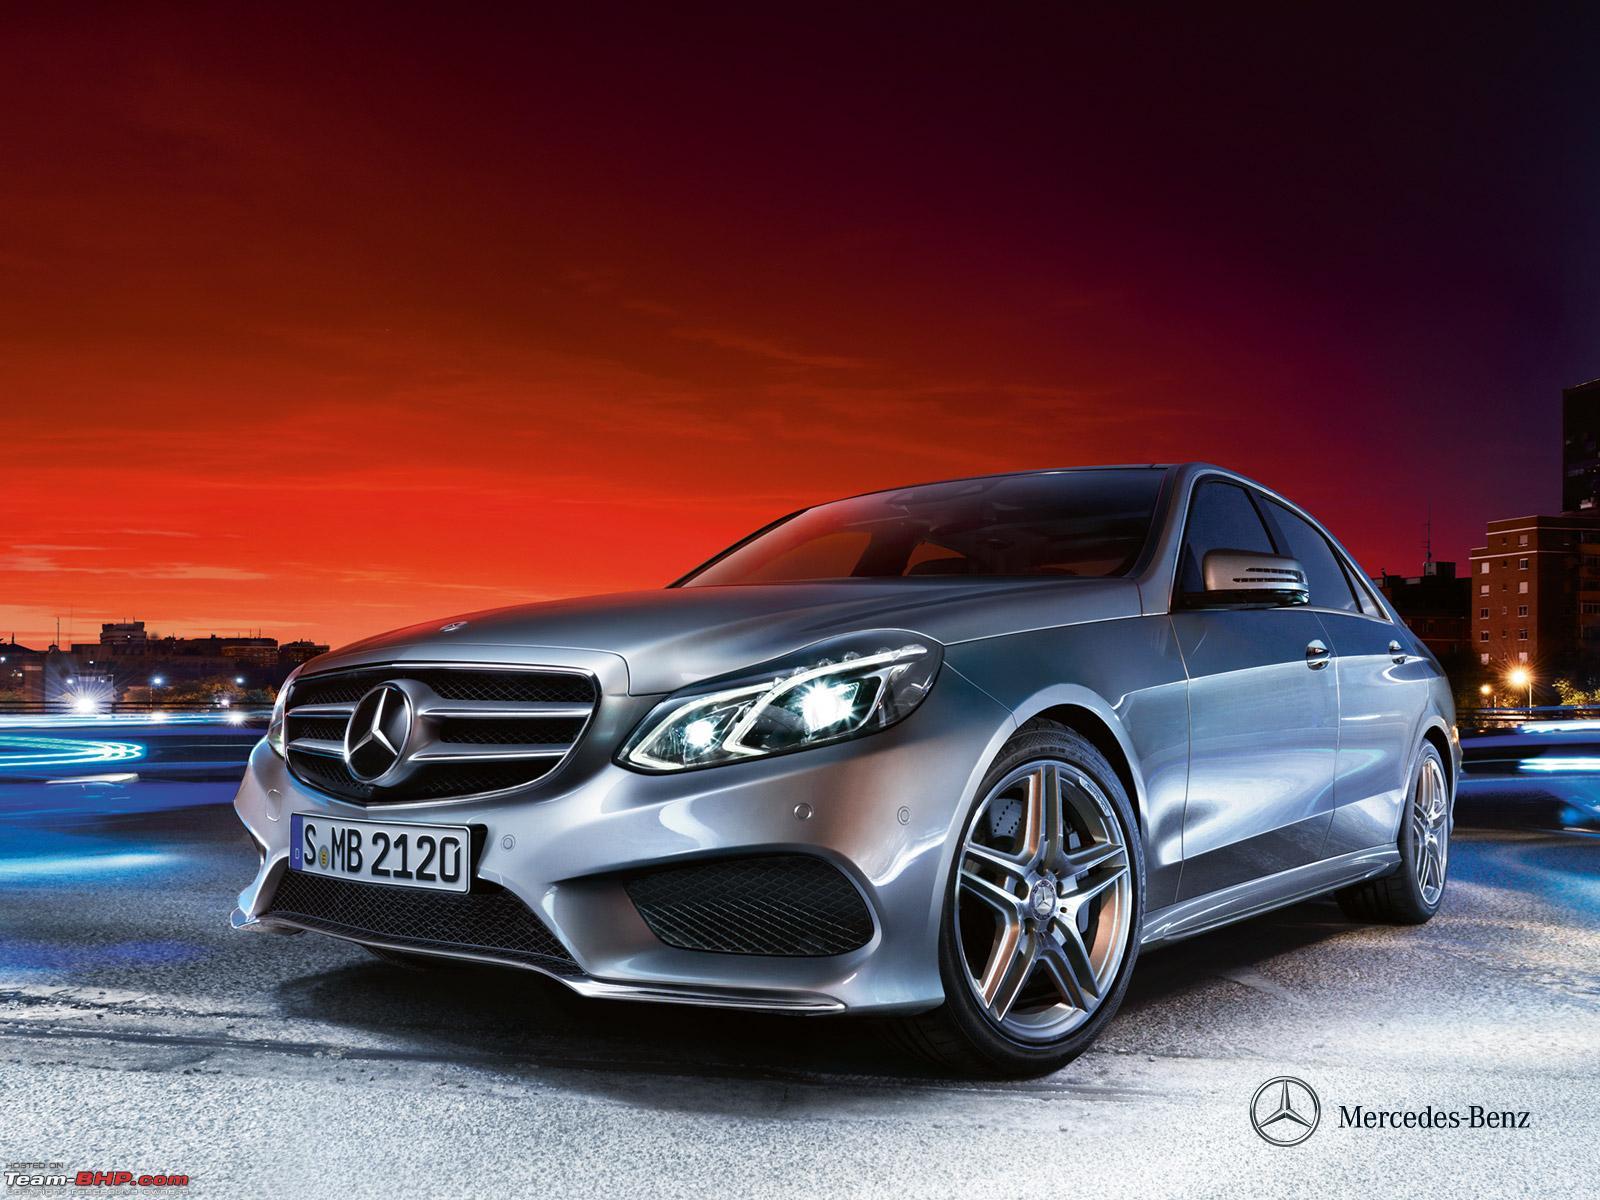 Mercedes benz india launches 2014 e class facelift team bhp for 2014 mercedes benz e